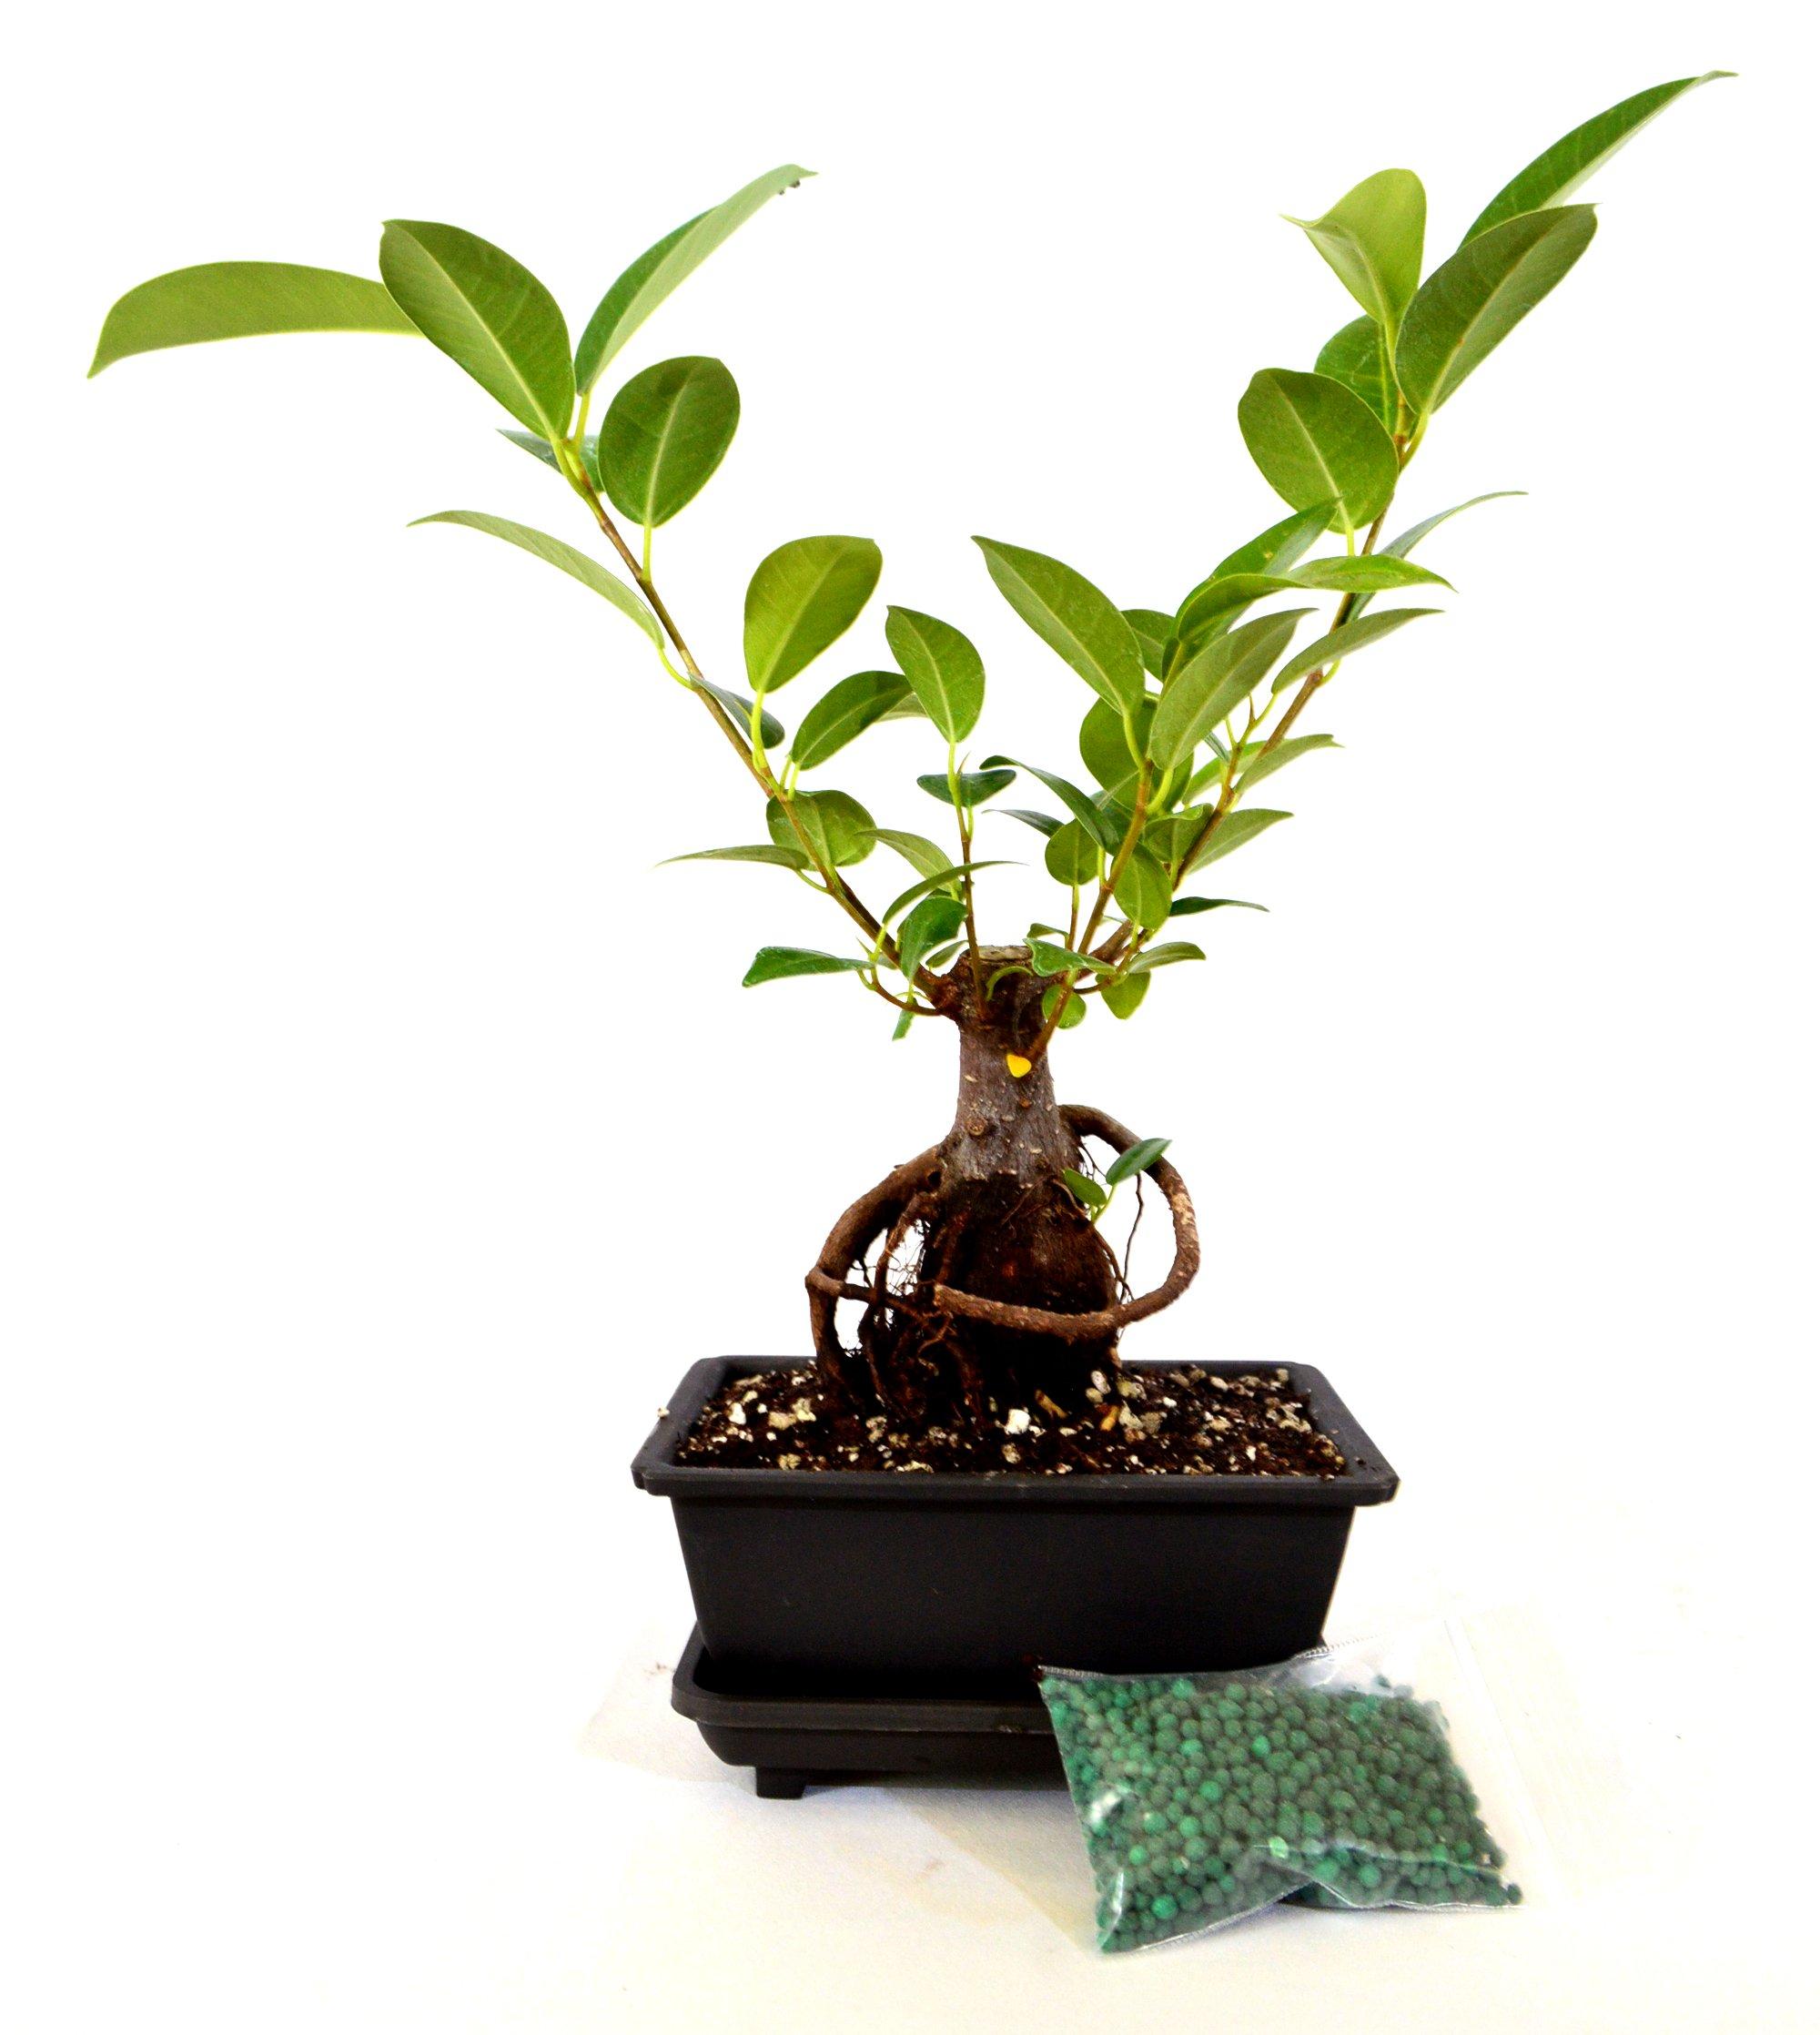 9GreenBox - Live Ginseng Ficus Bonsai Tree Bonsai - Small Ficus Retusa - Water Tray & Fertilizer Gift